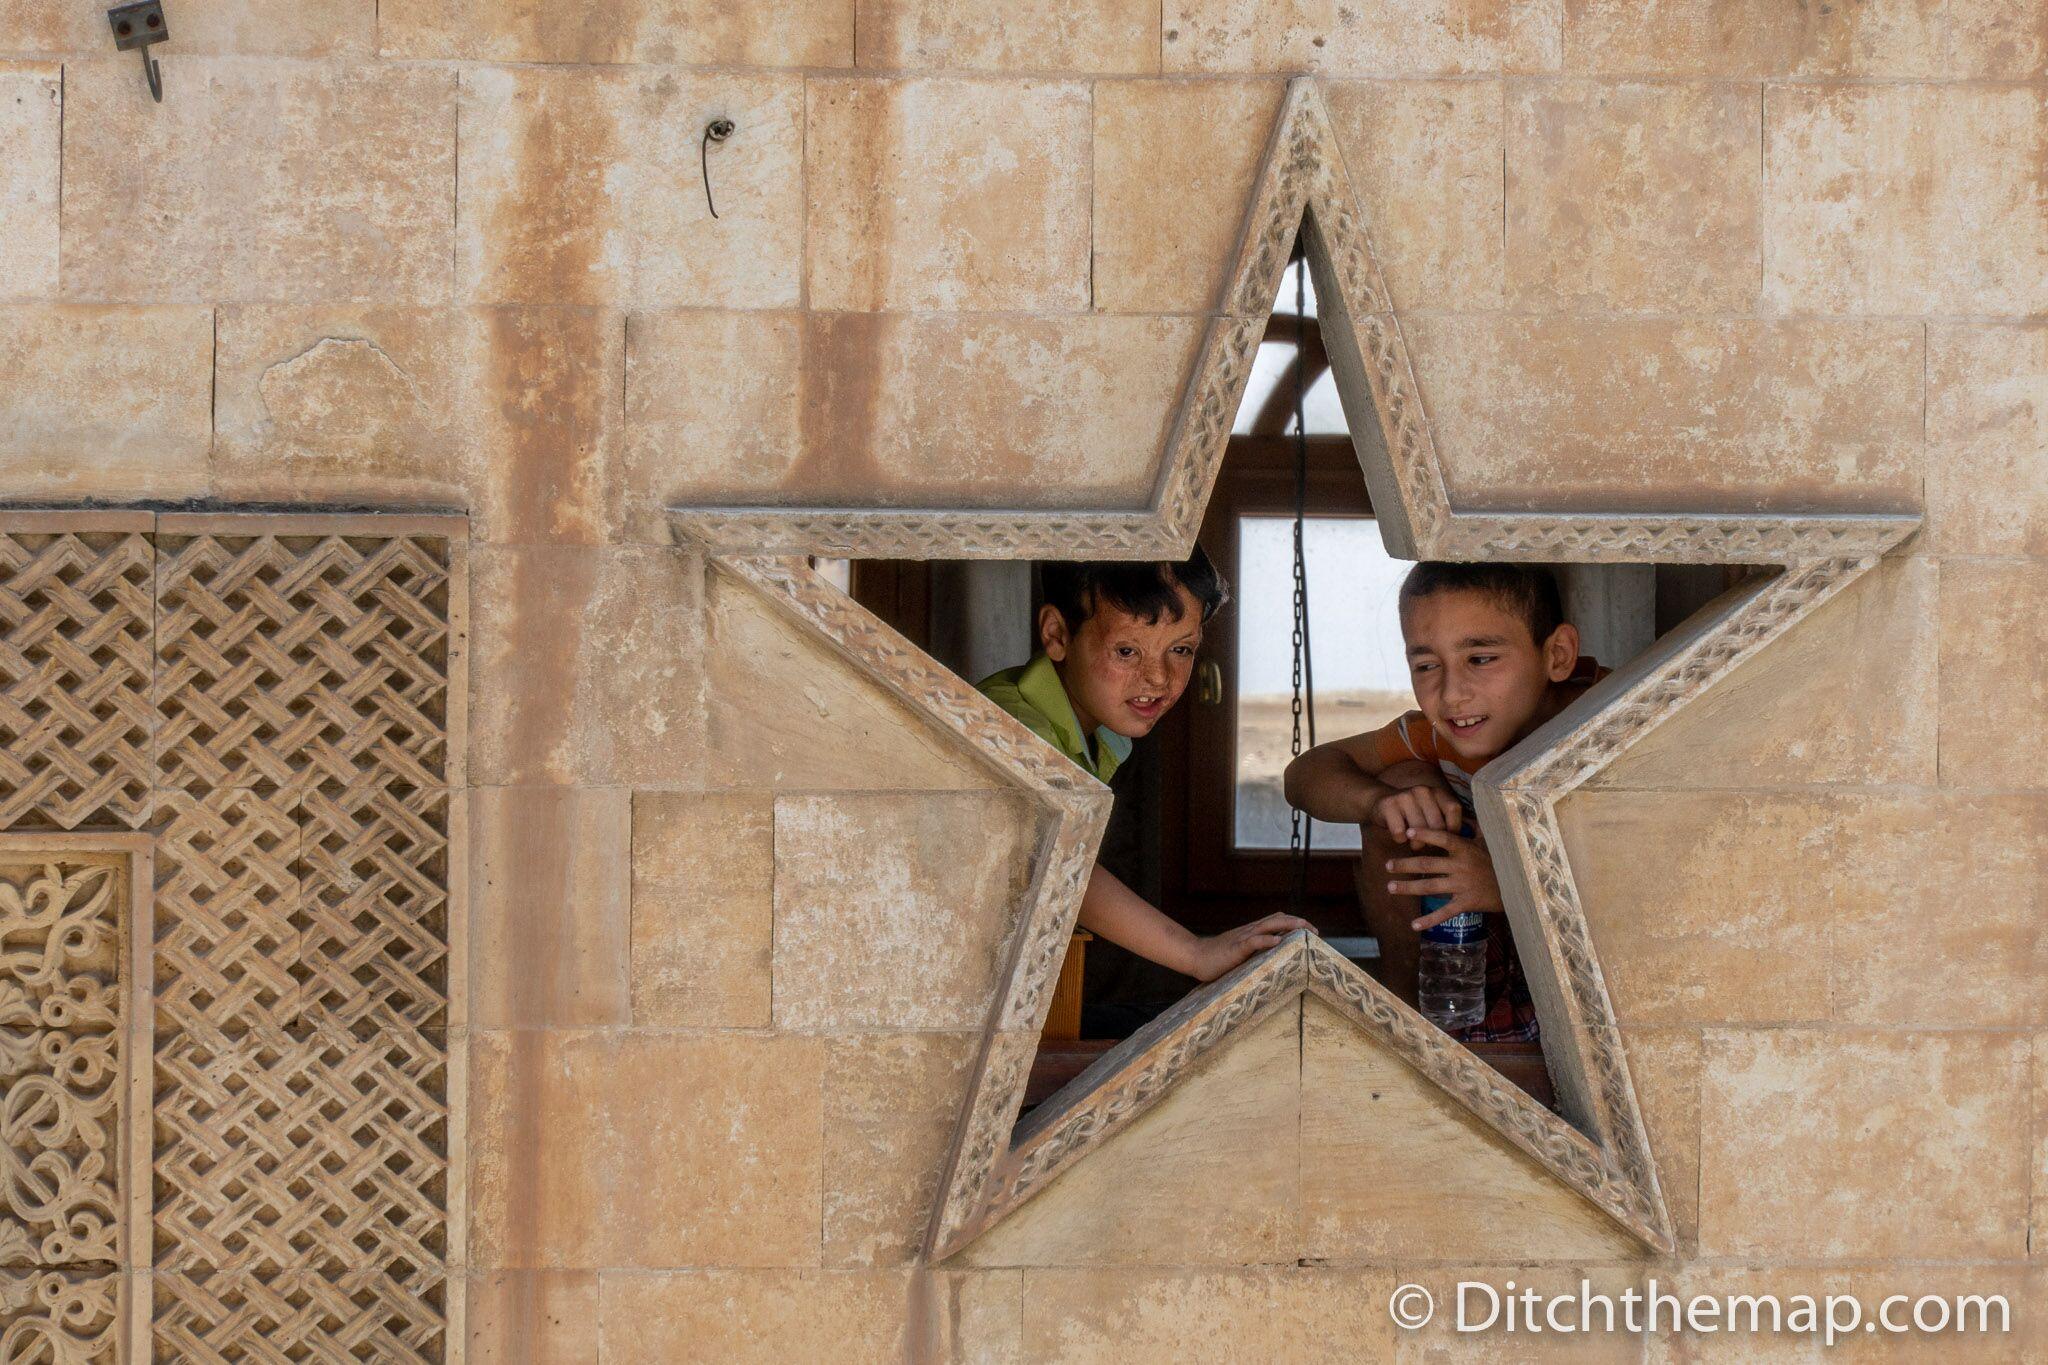 Children pose for a photograph in Mardin, Turkey